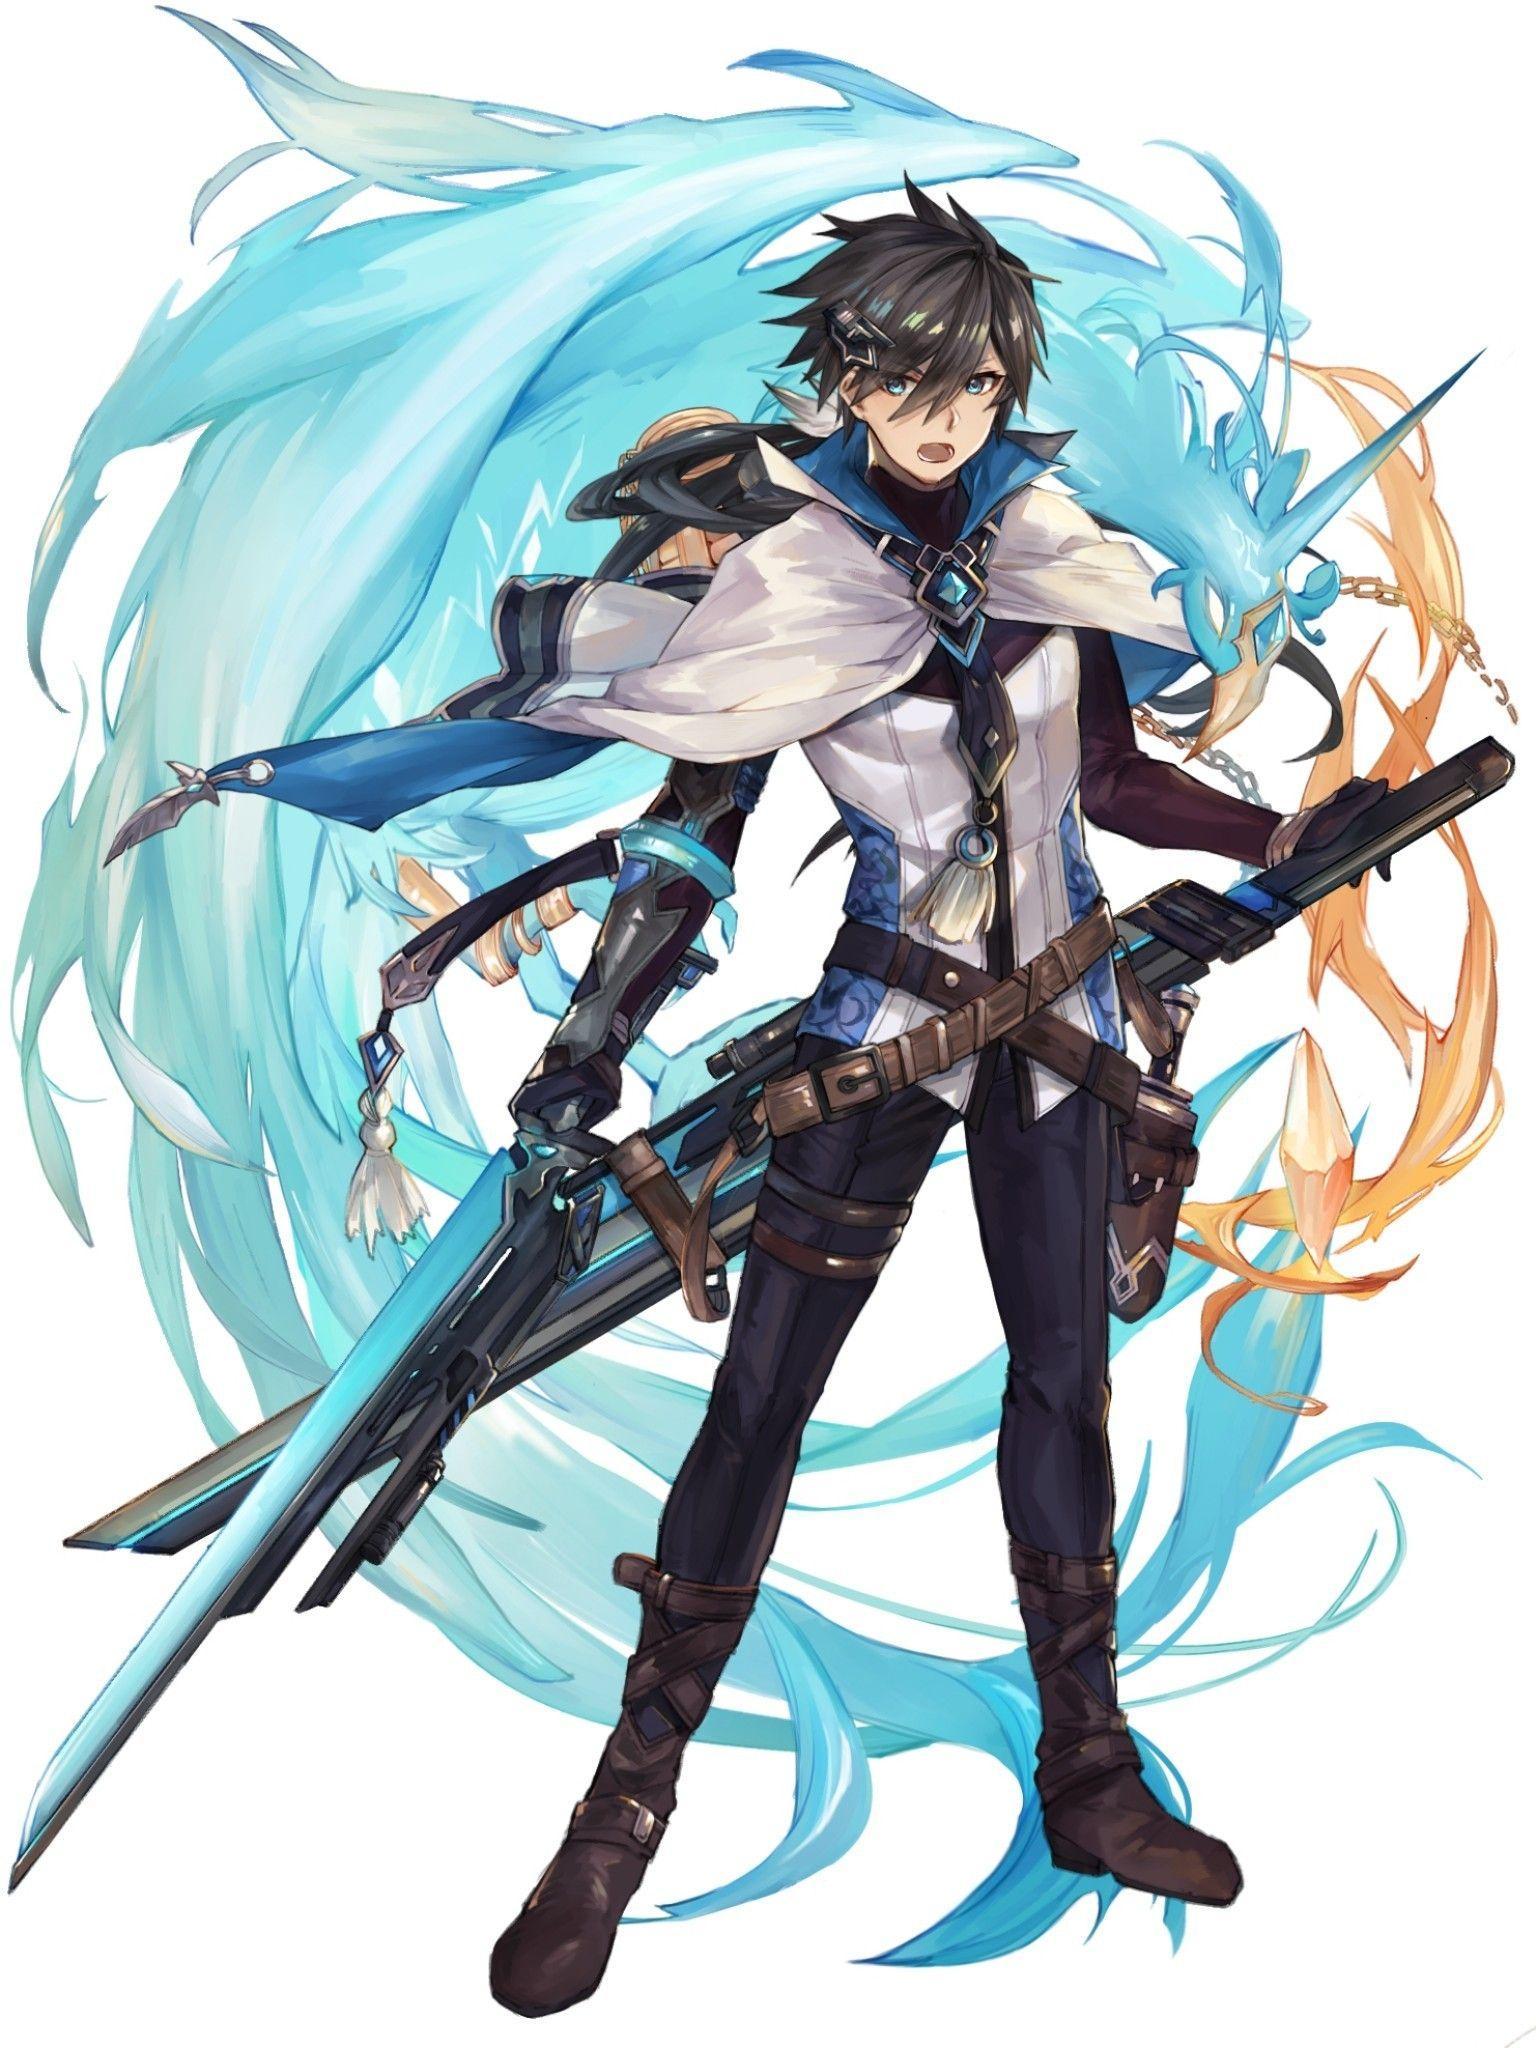 Mini Anime Wallpapers Top Free Mini Anime Backgrounds Wallpaperaccess